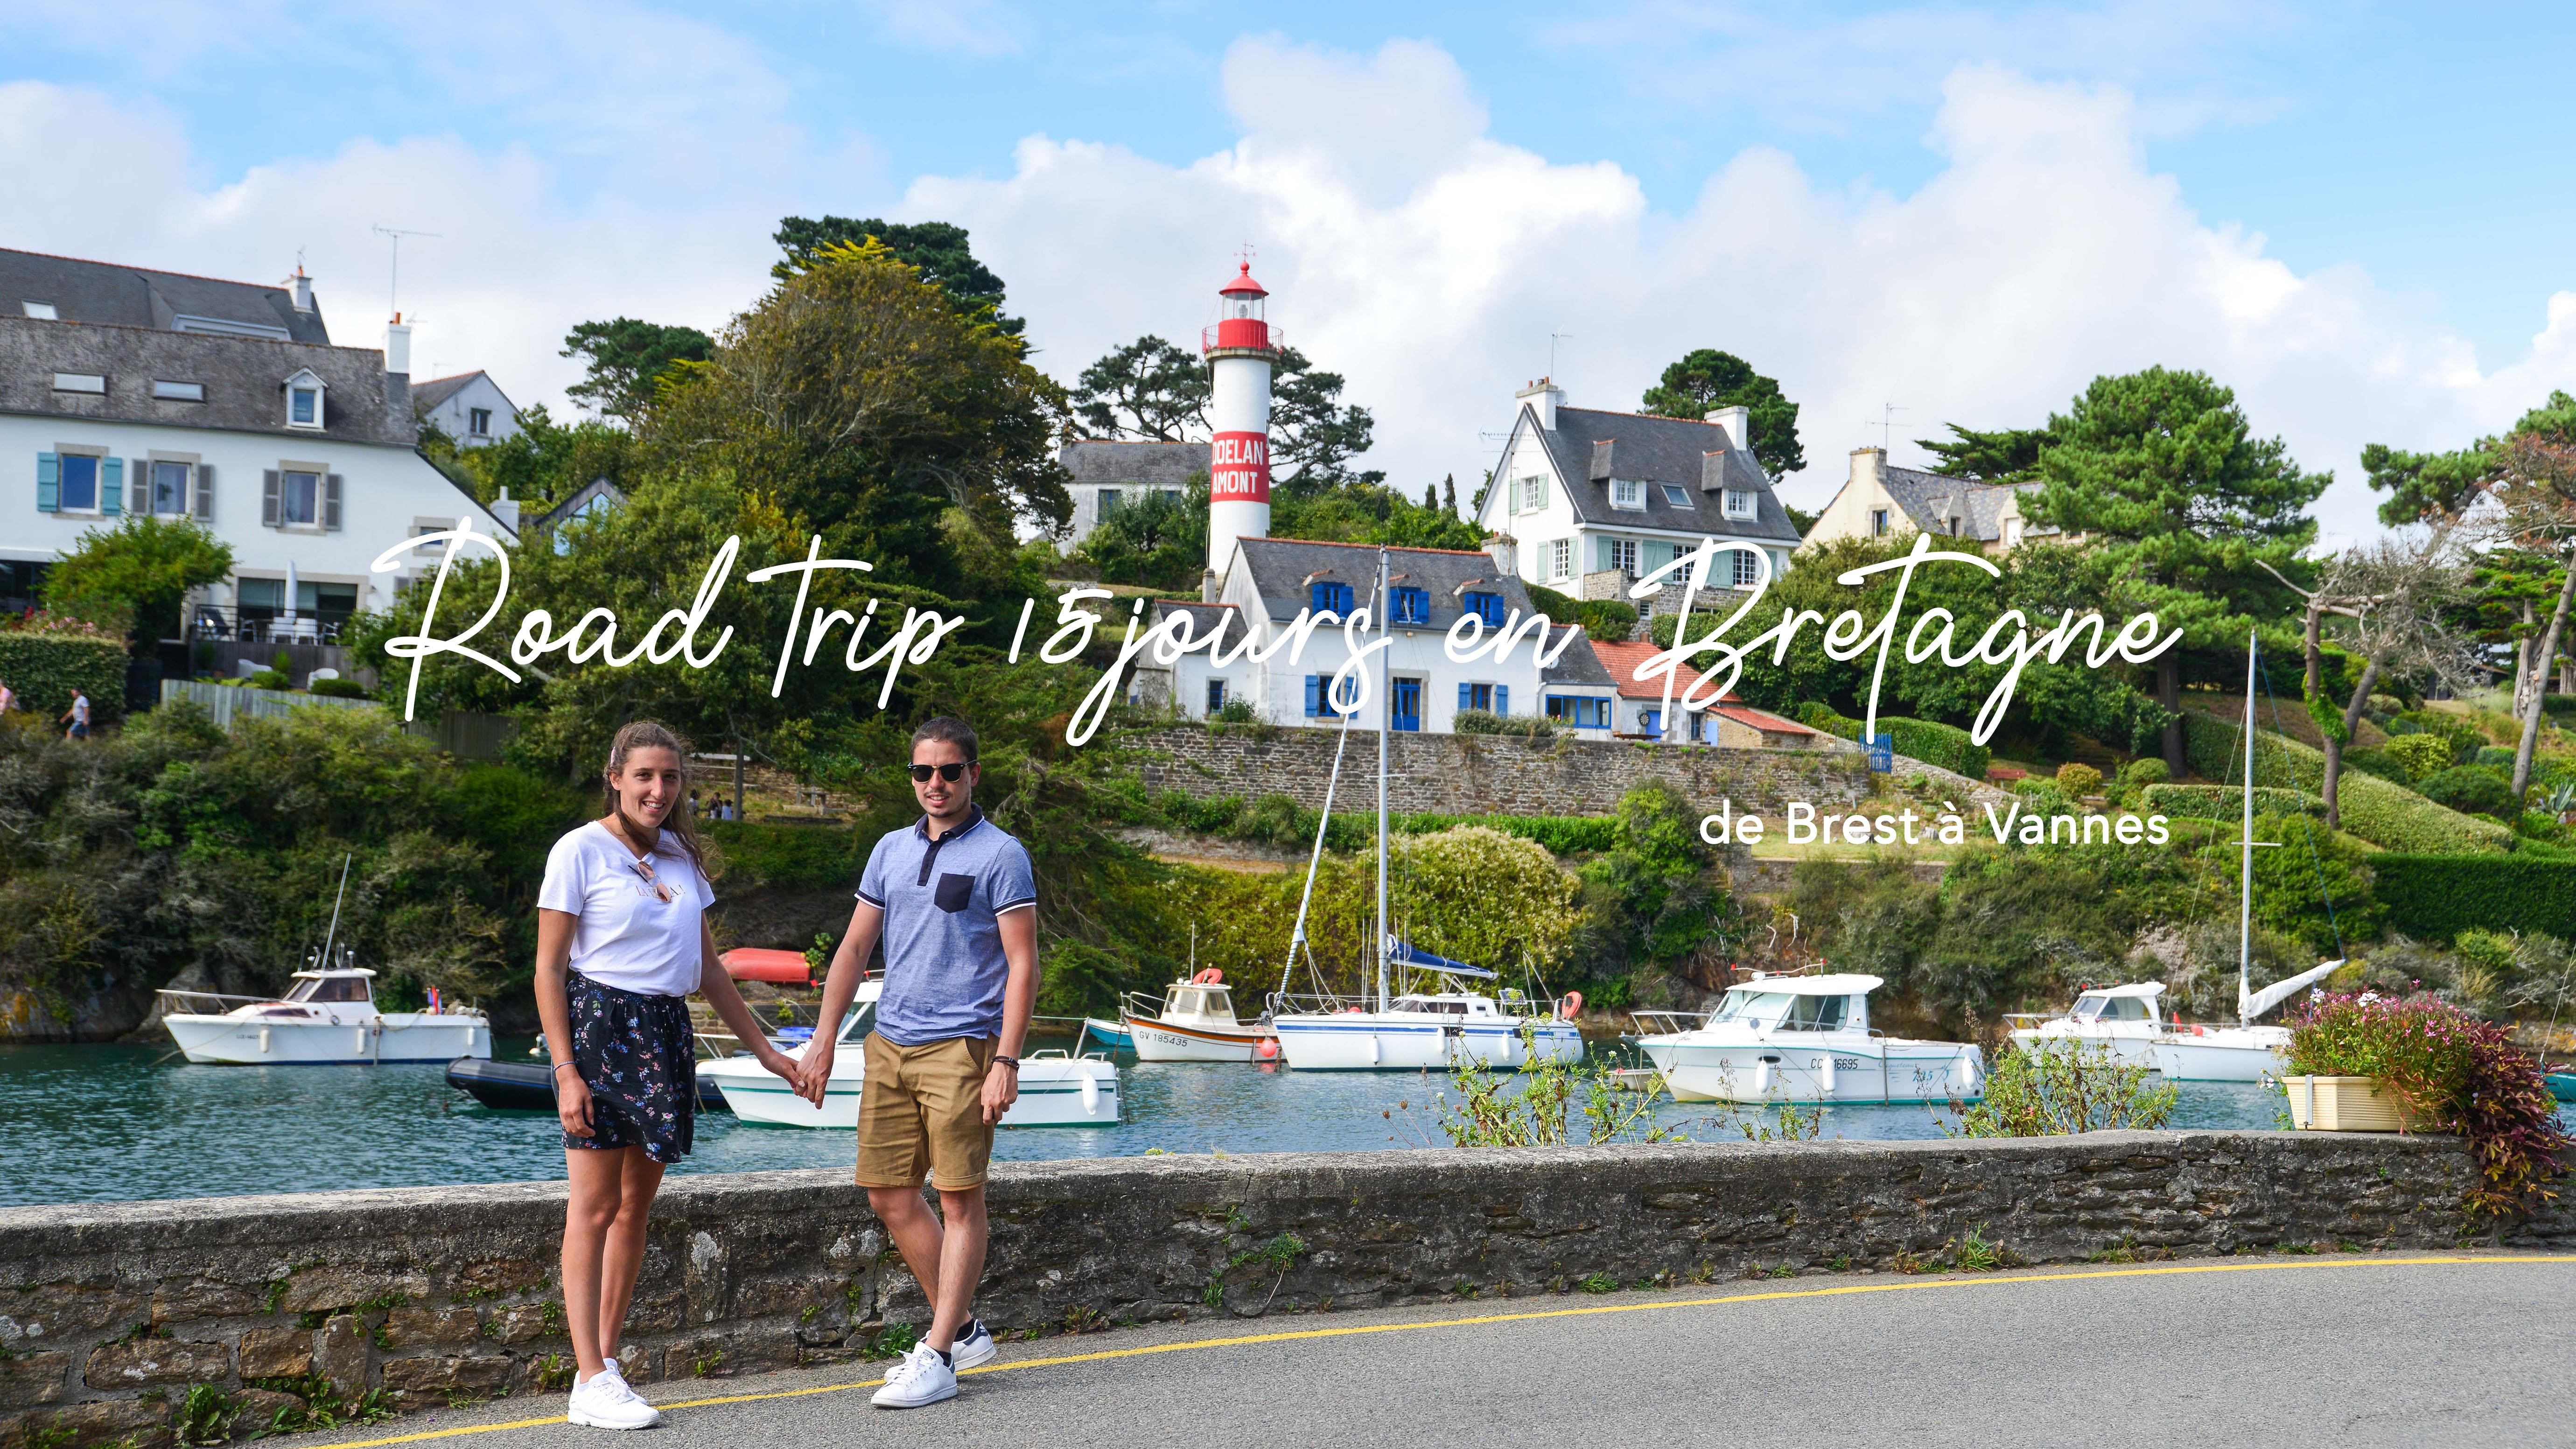 Road trip de 15 jours en Bretagne